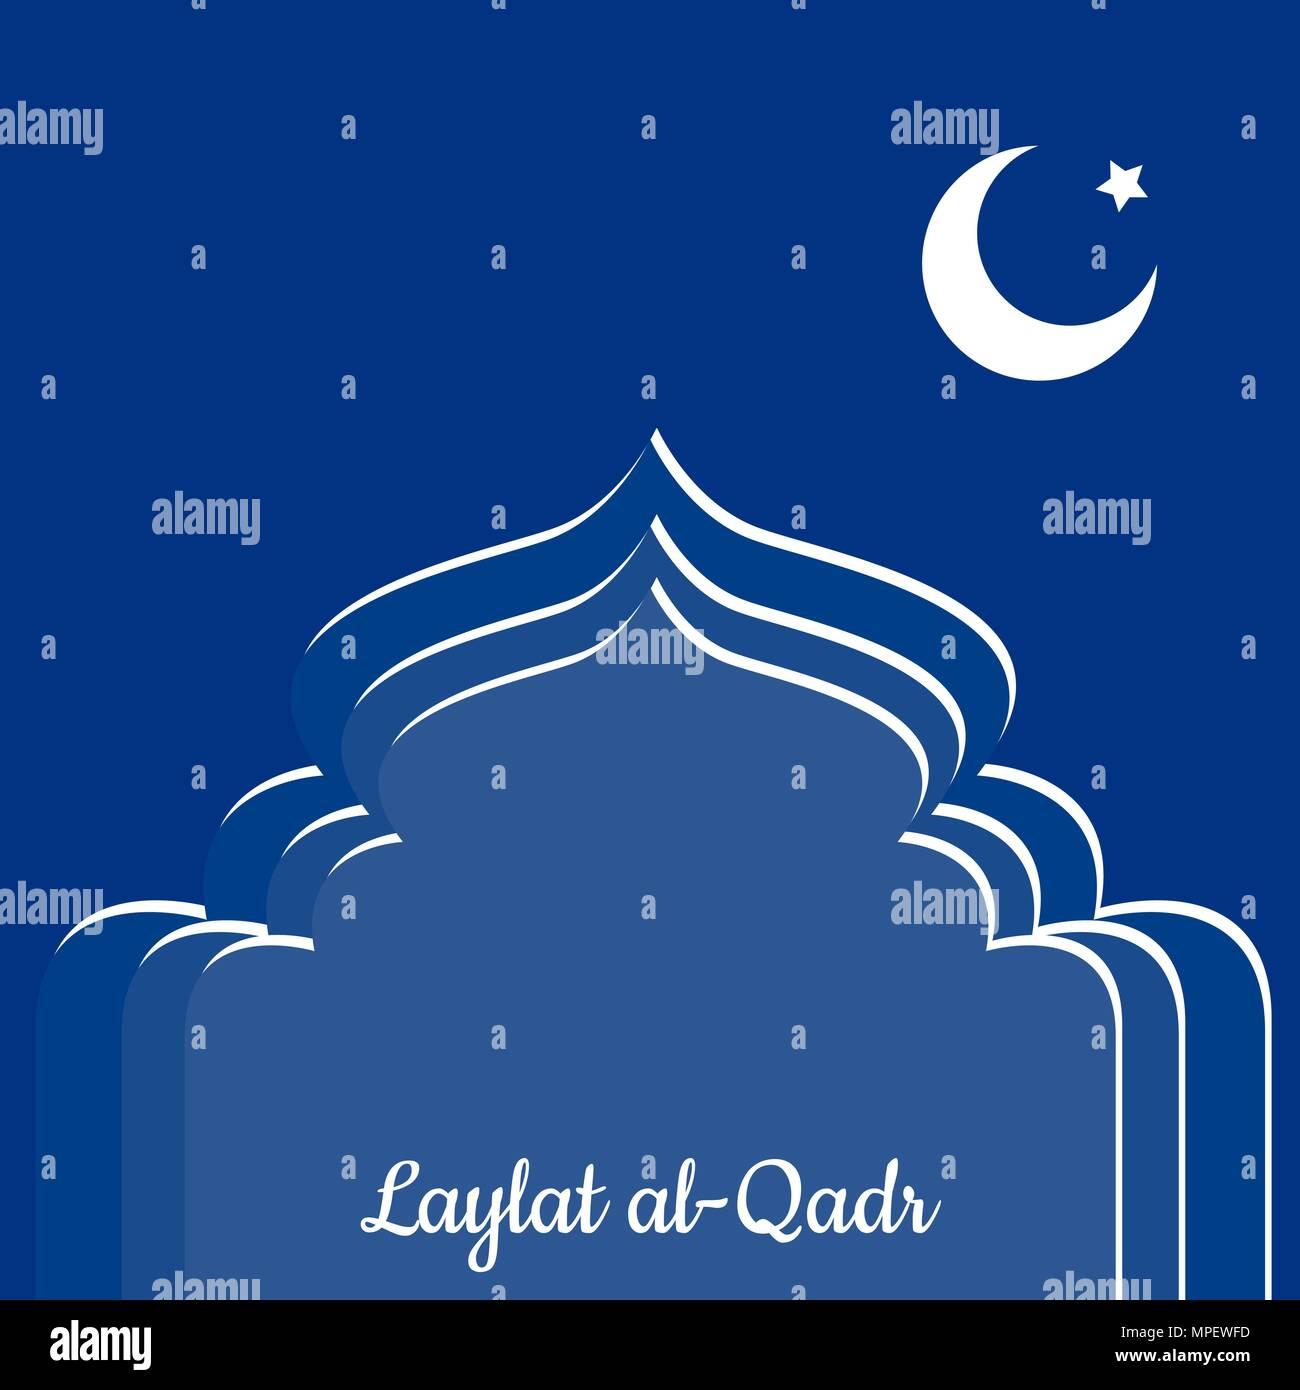 Laylat Al Qadr Concept Of The Islamic Religion Holiday Symbolic